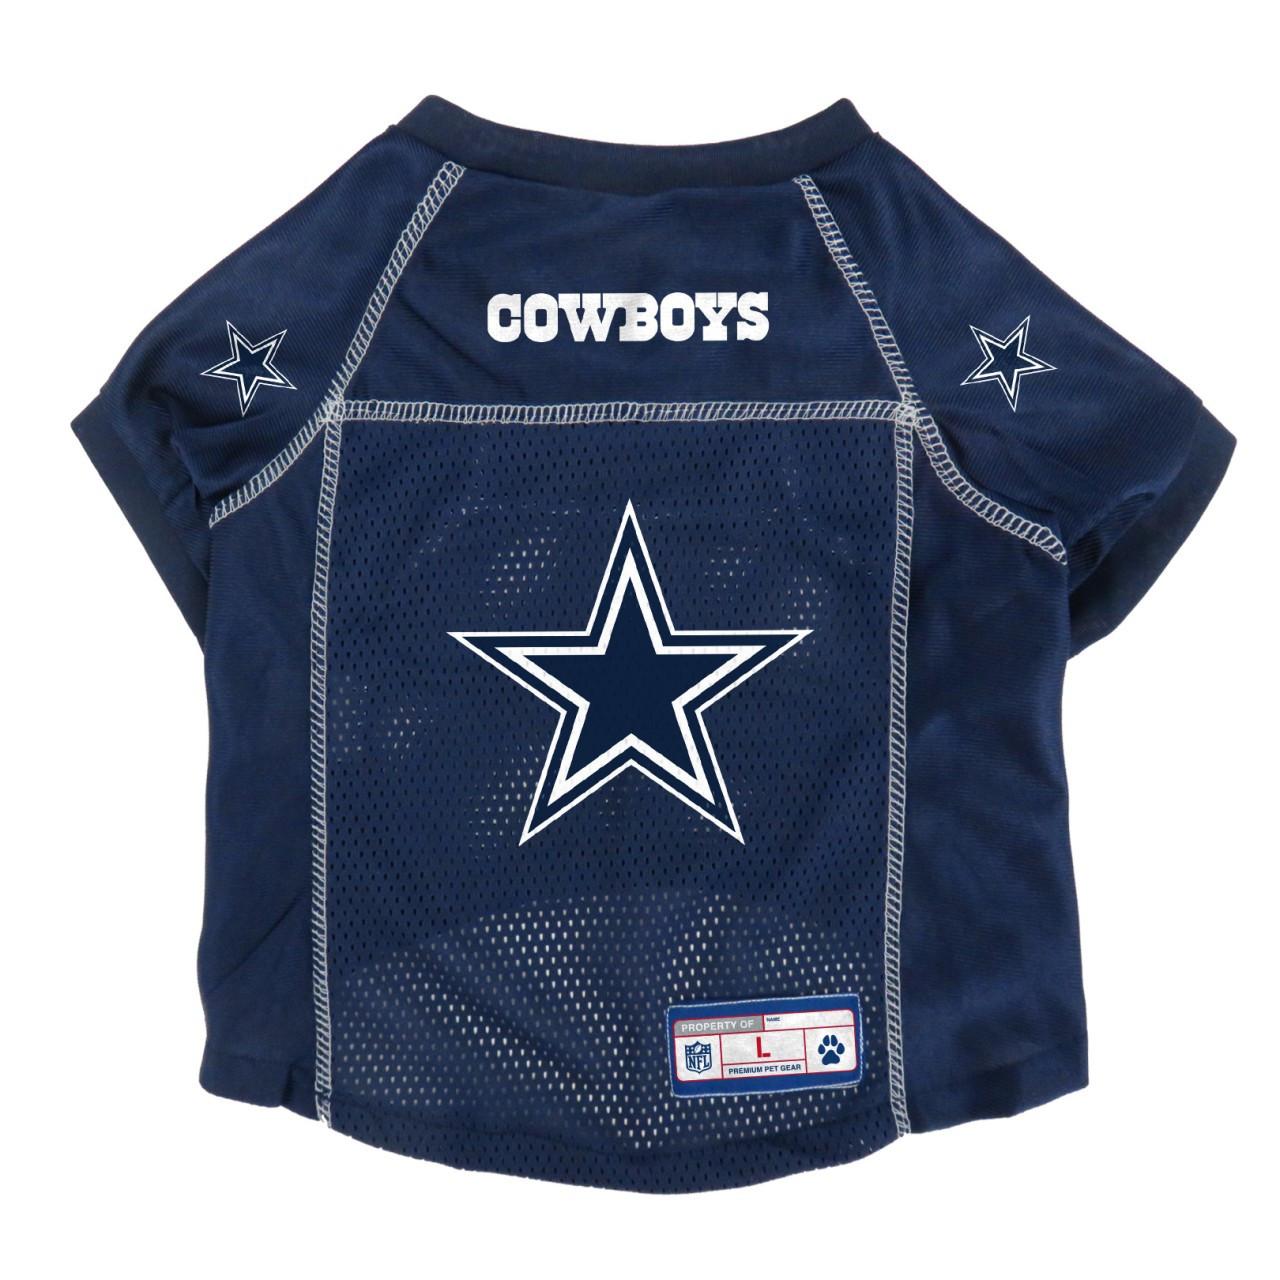 92122c4da2d ... greece dallas cowboys pet jersey 472fc 99cbc